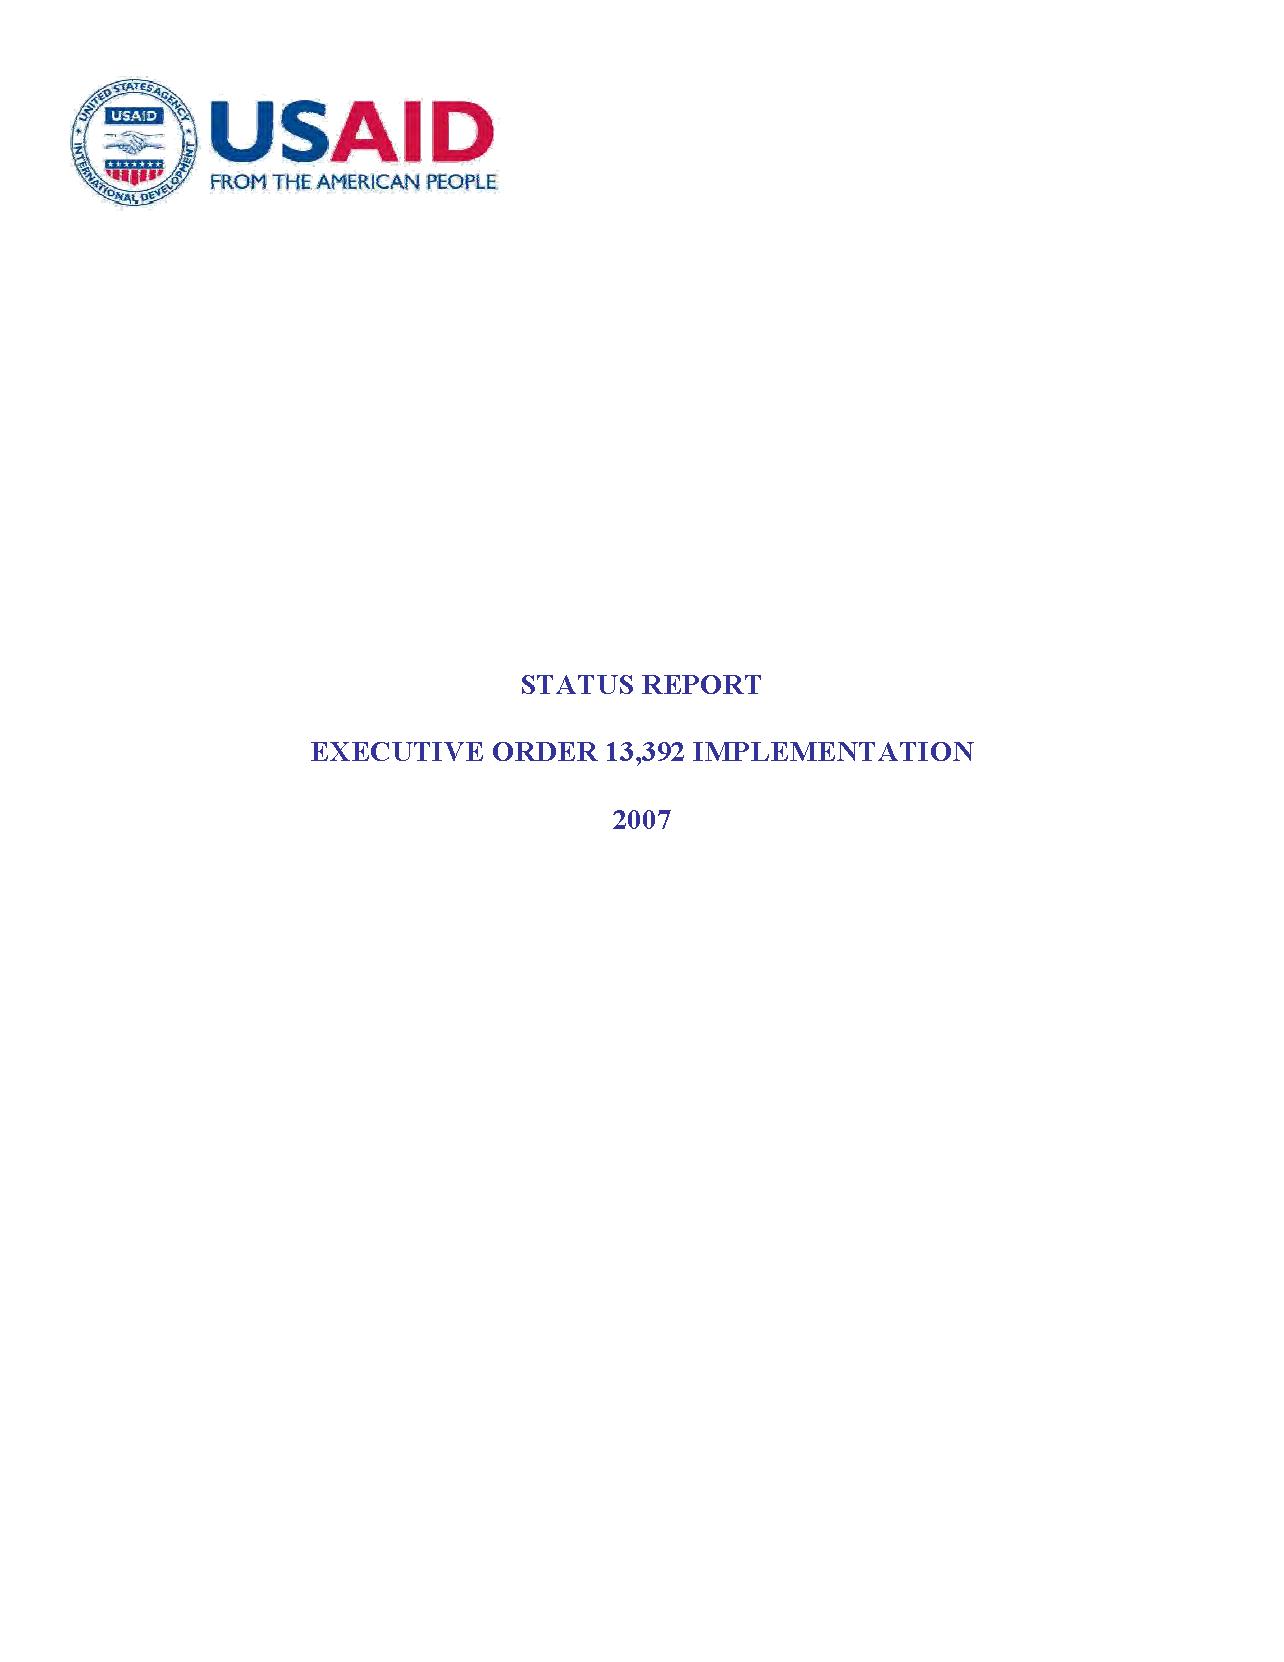 Status Report: Executive Order 13,392 Implementation - 2007